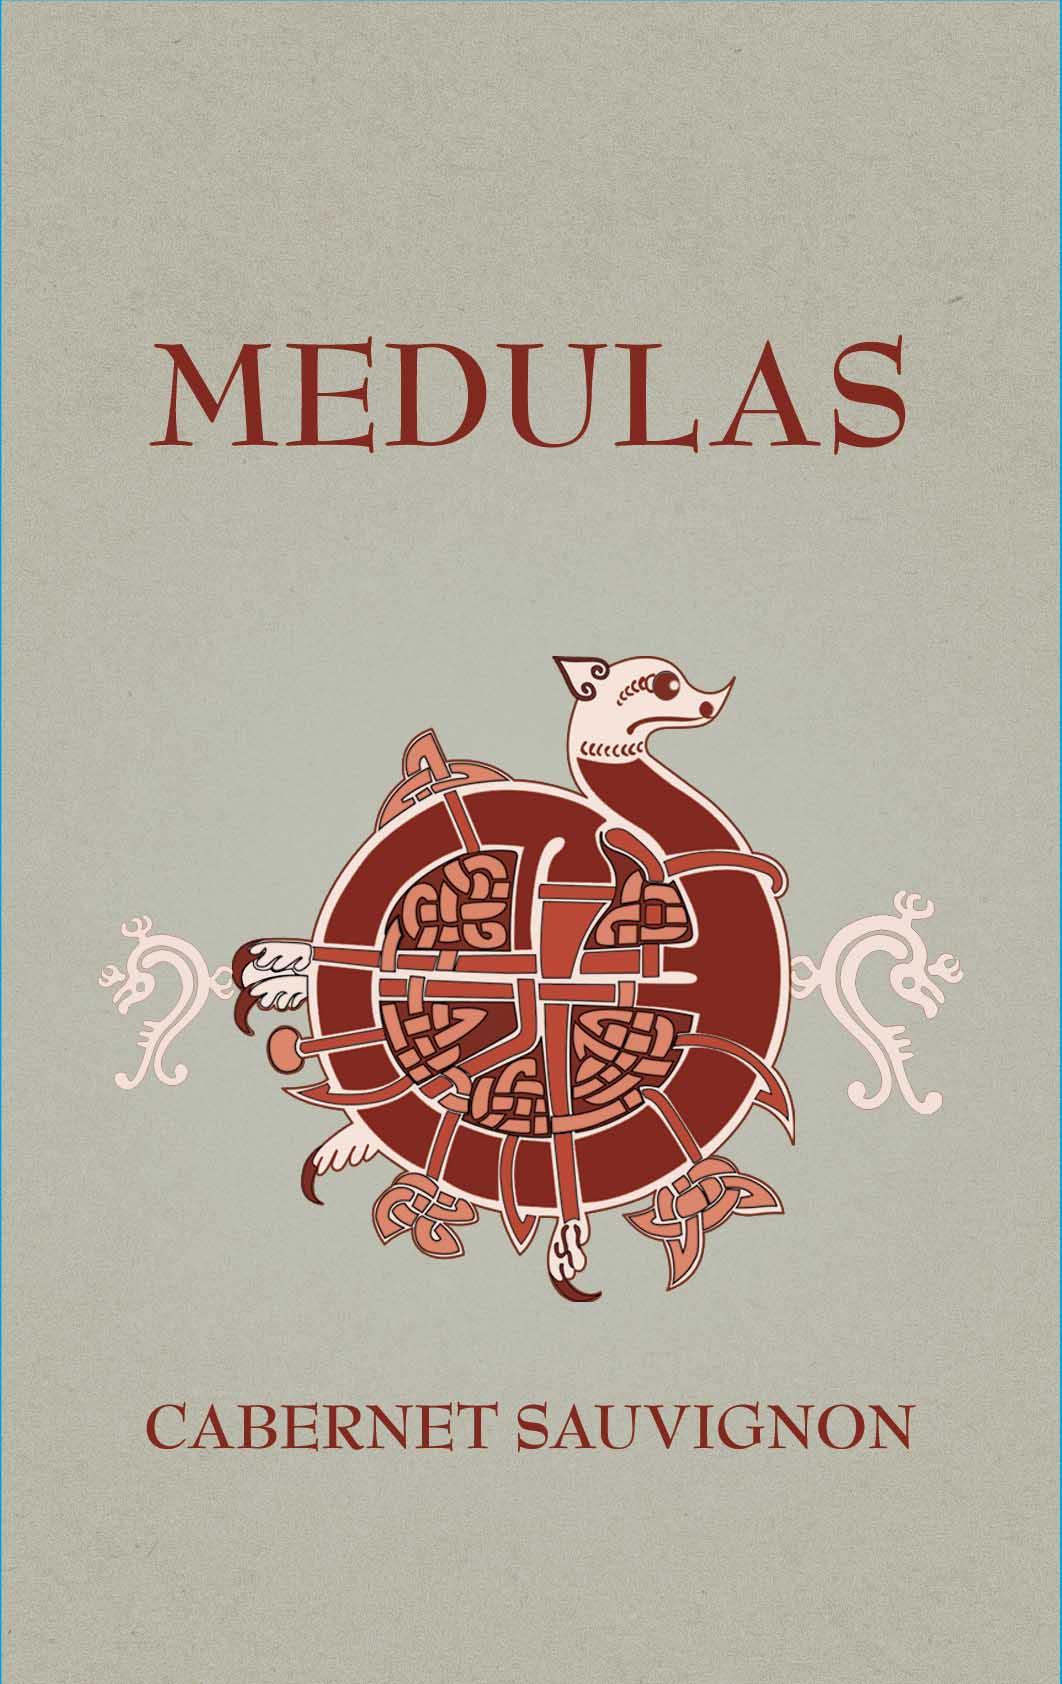 Front Medulas.jpg